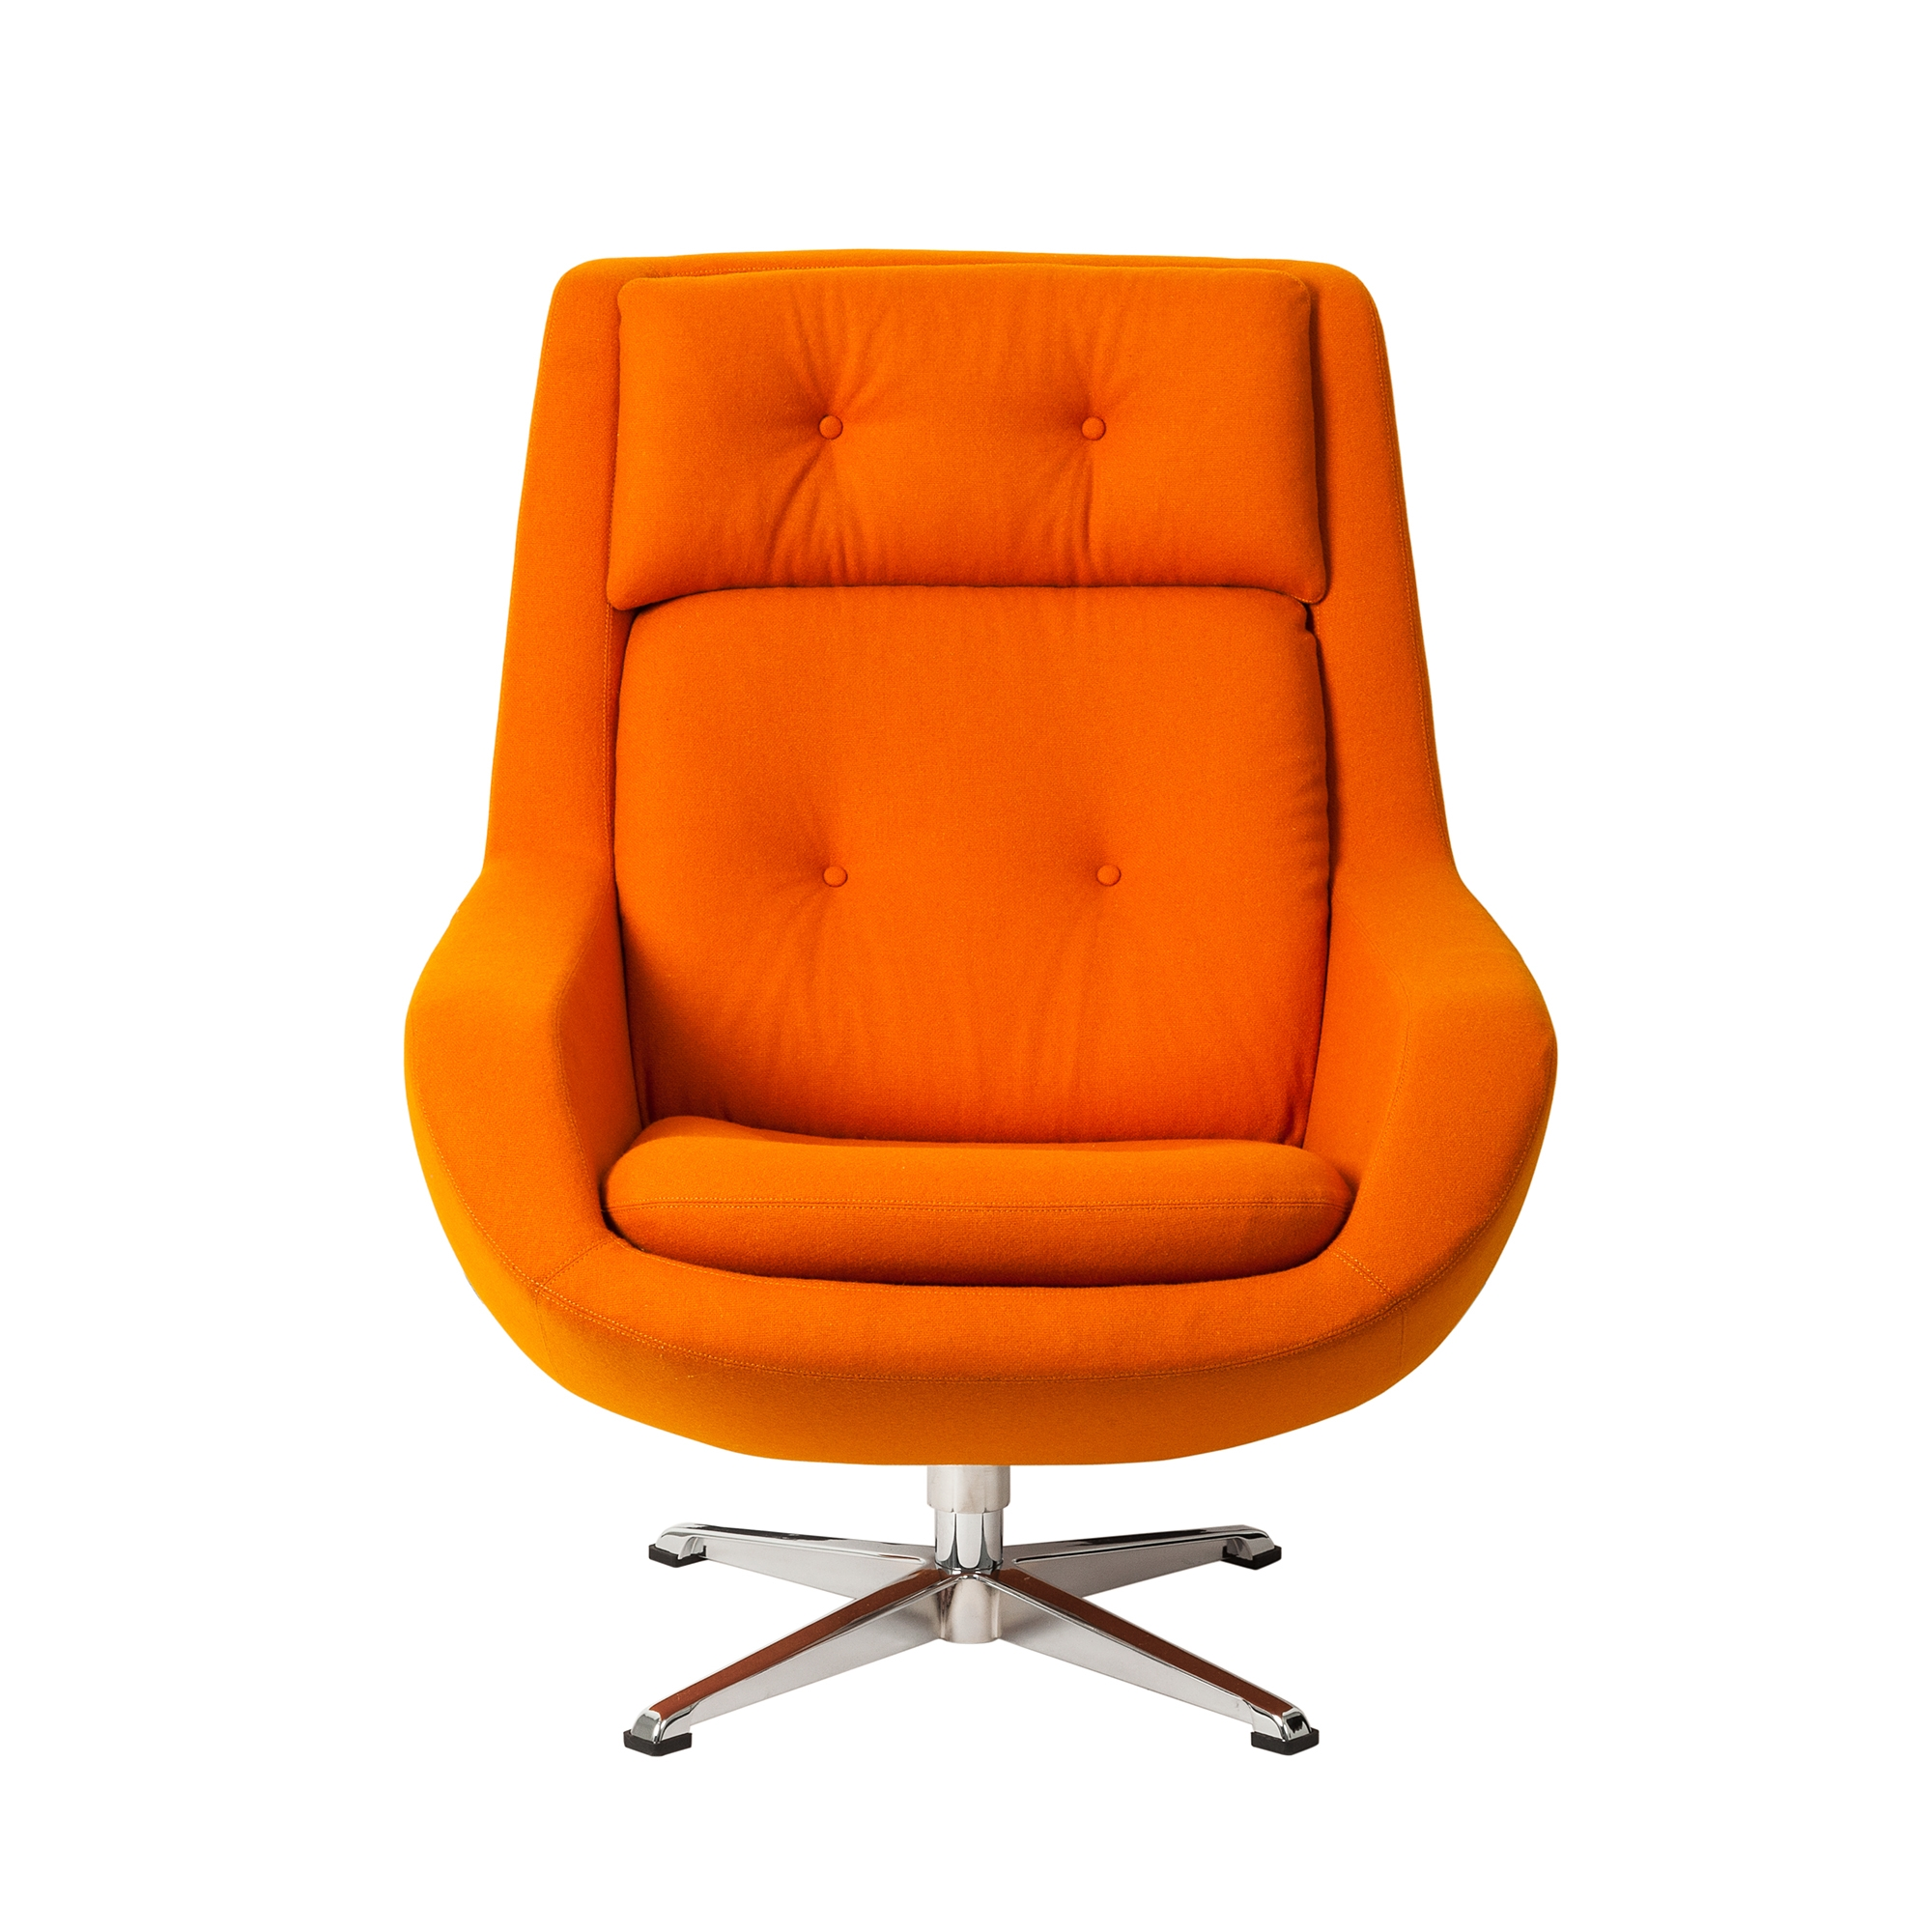 Koppla Swivel Chair, Orange